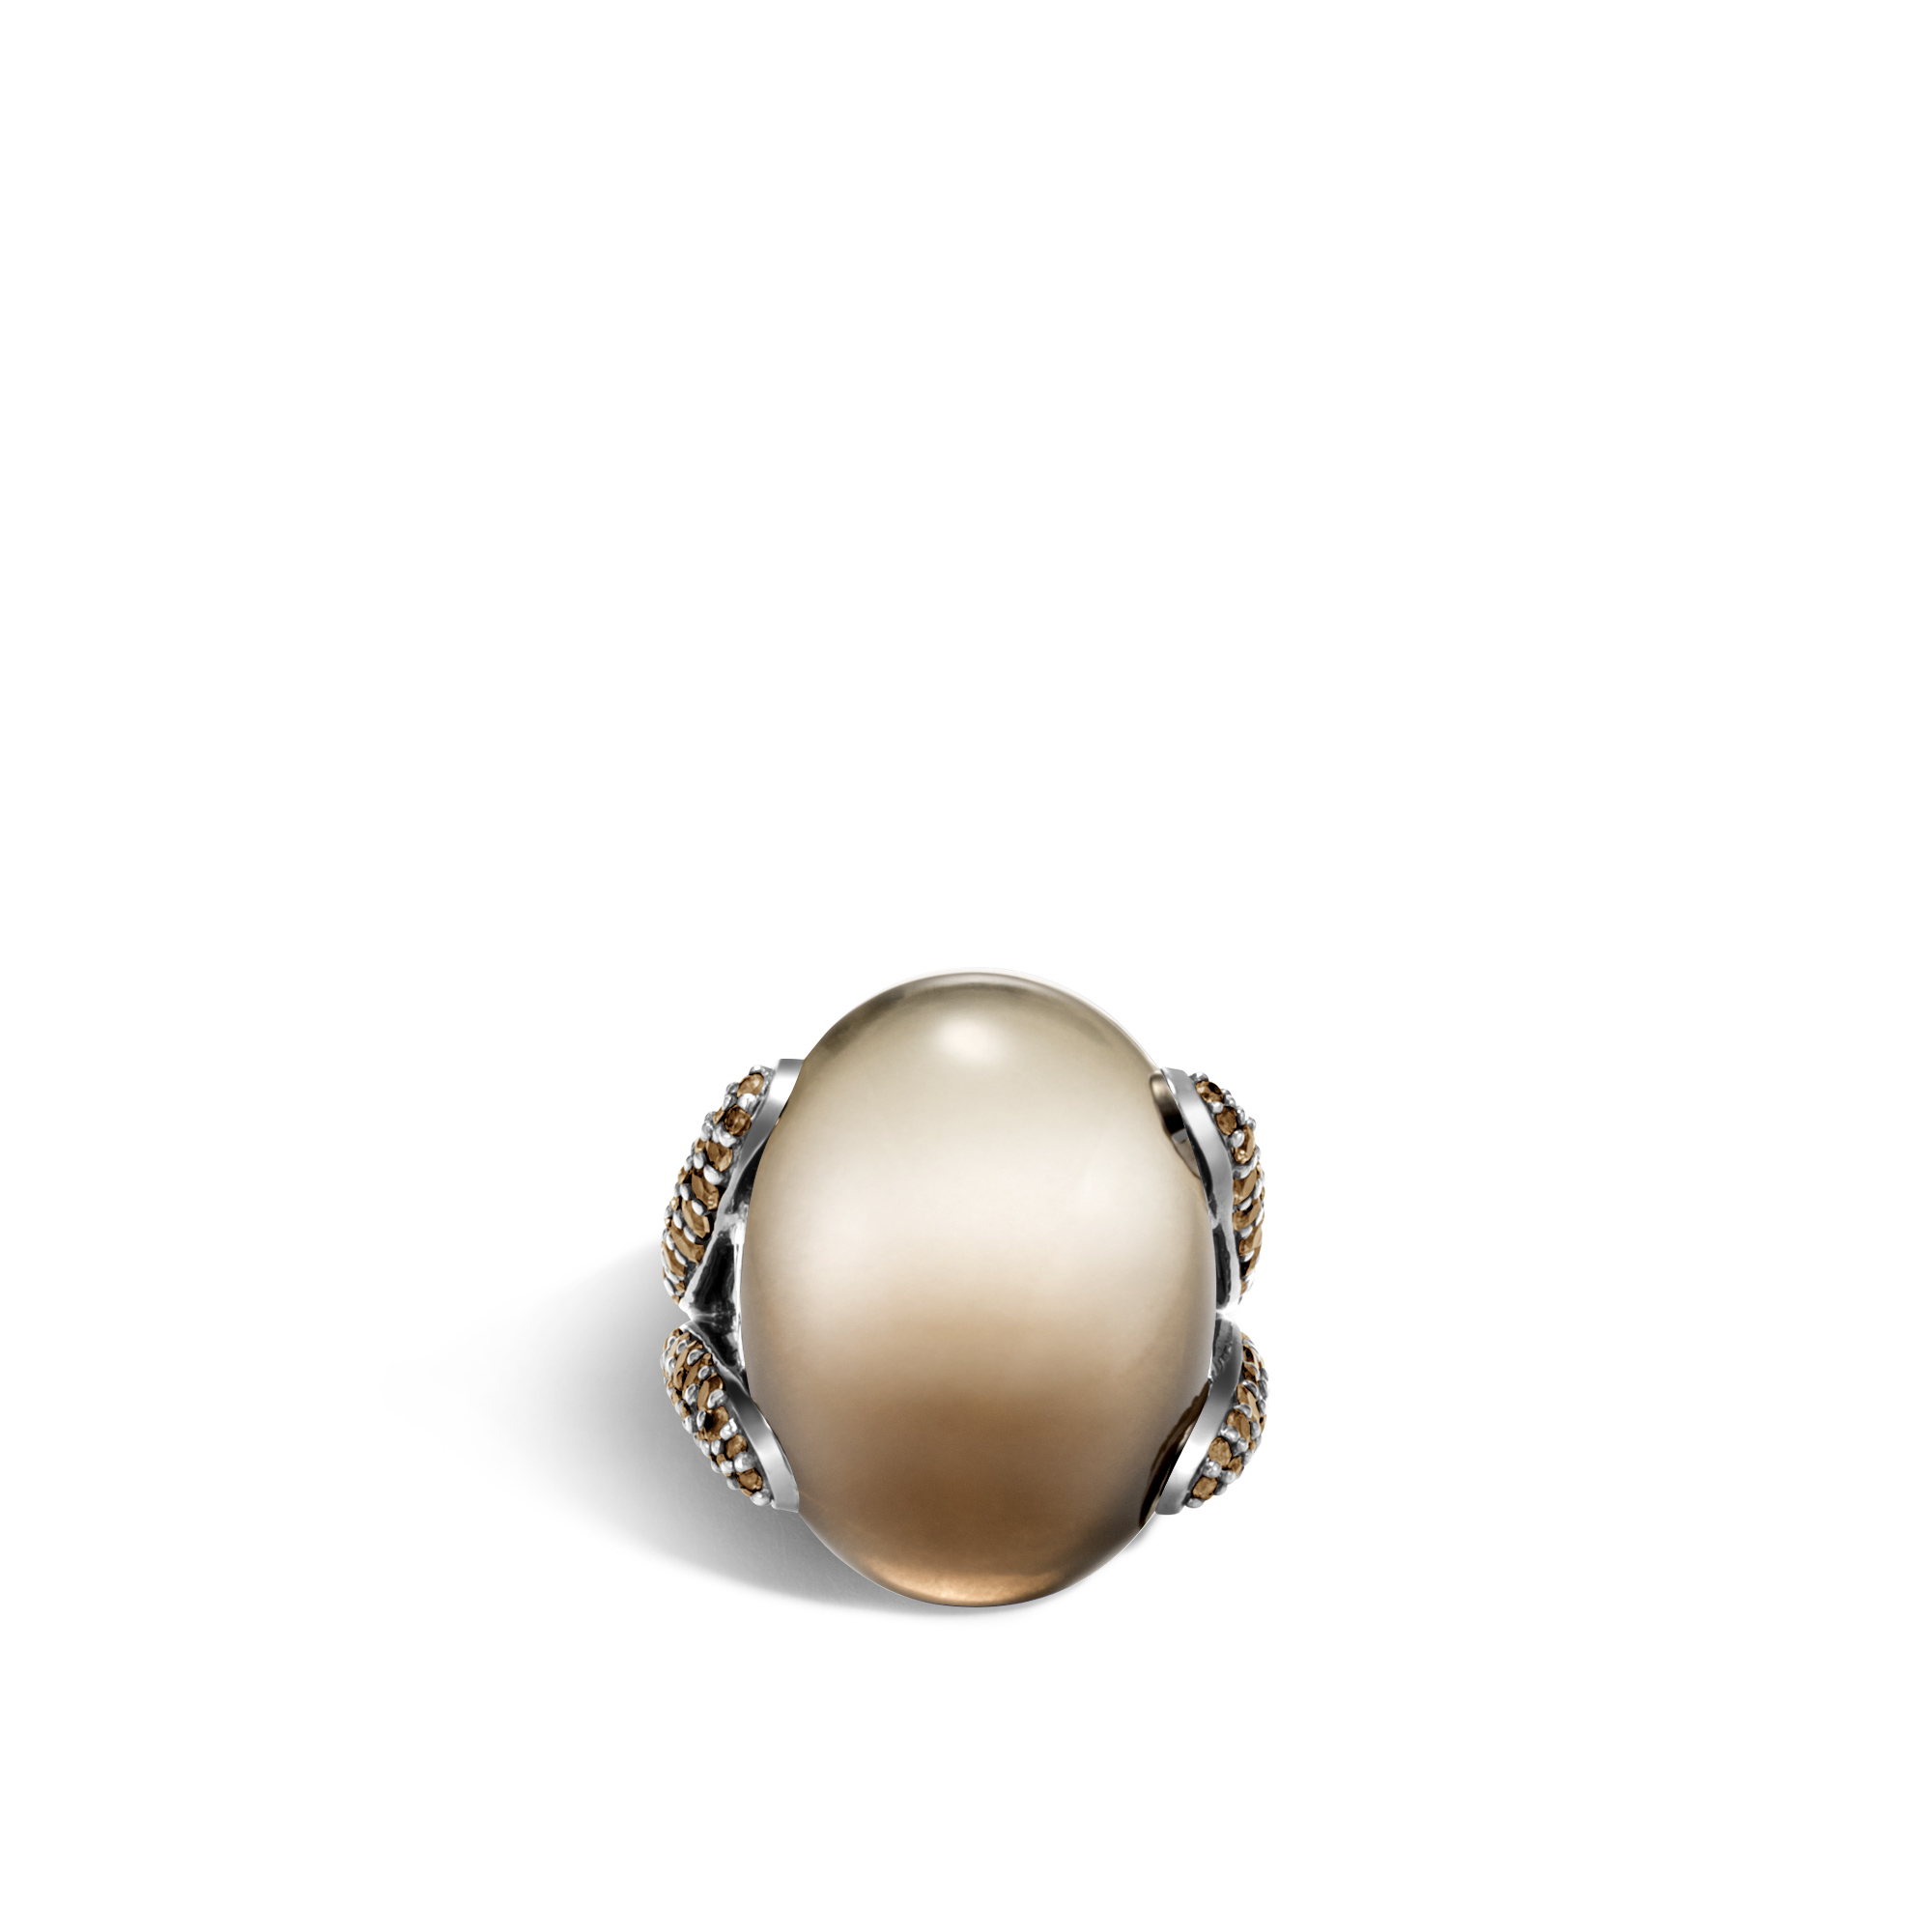 Classic Chain Celestial Orb Ring, Silver, 24x18MM Gemstone, Bicolor Smoky Quartz, large